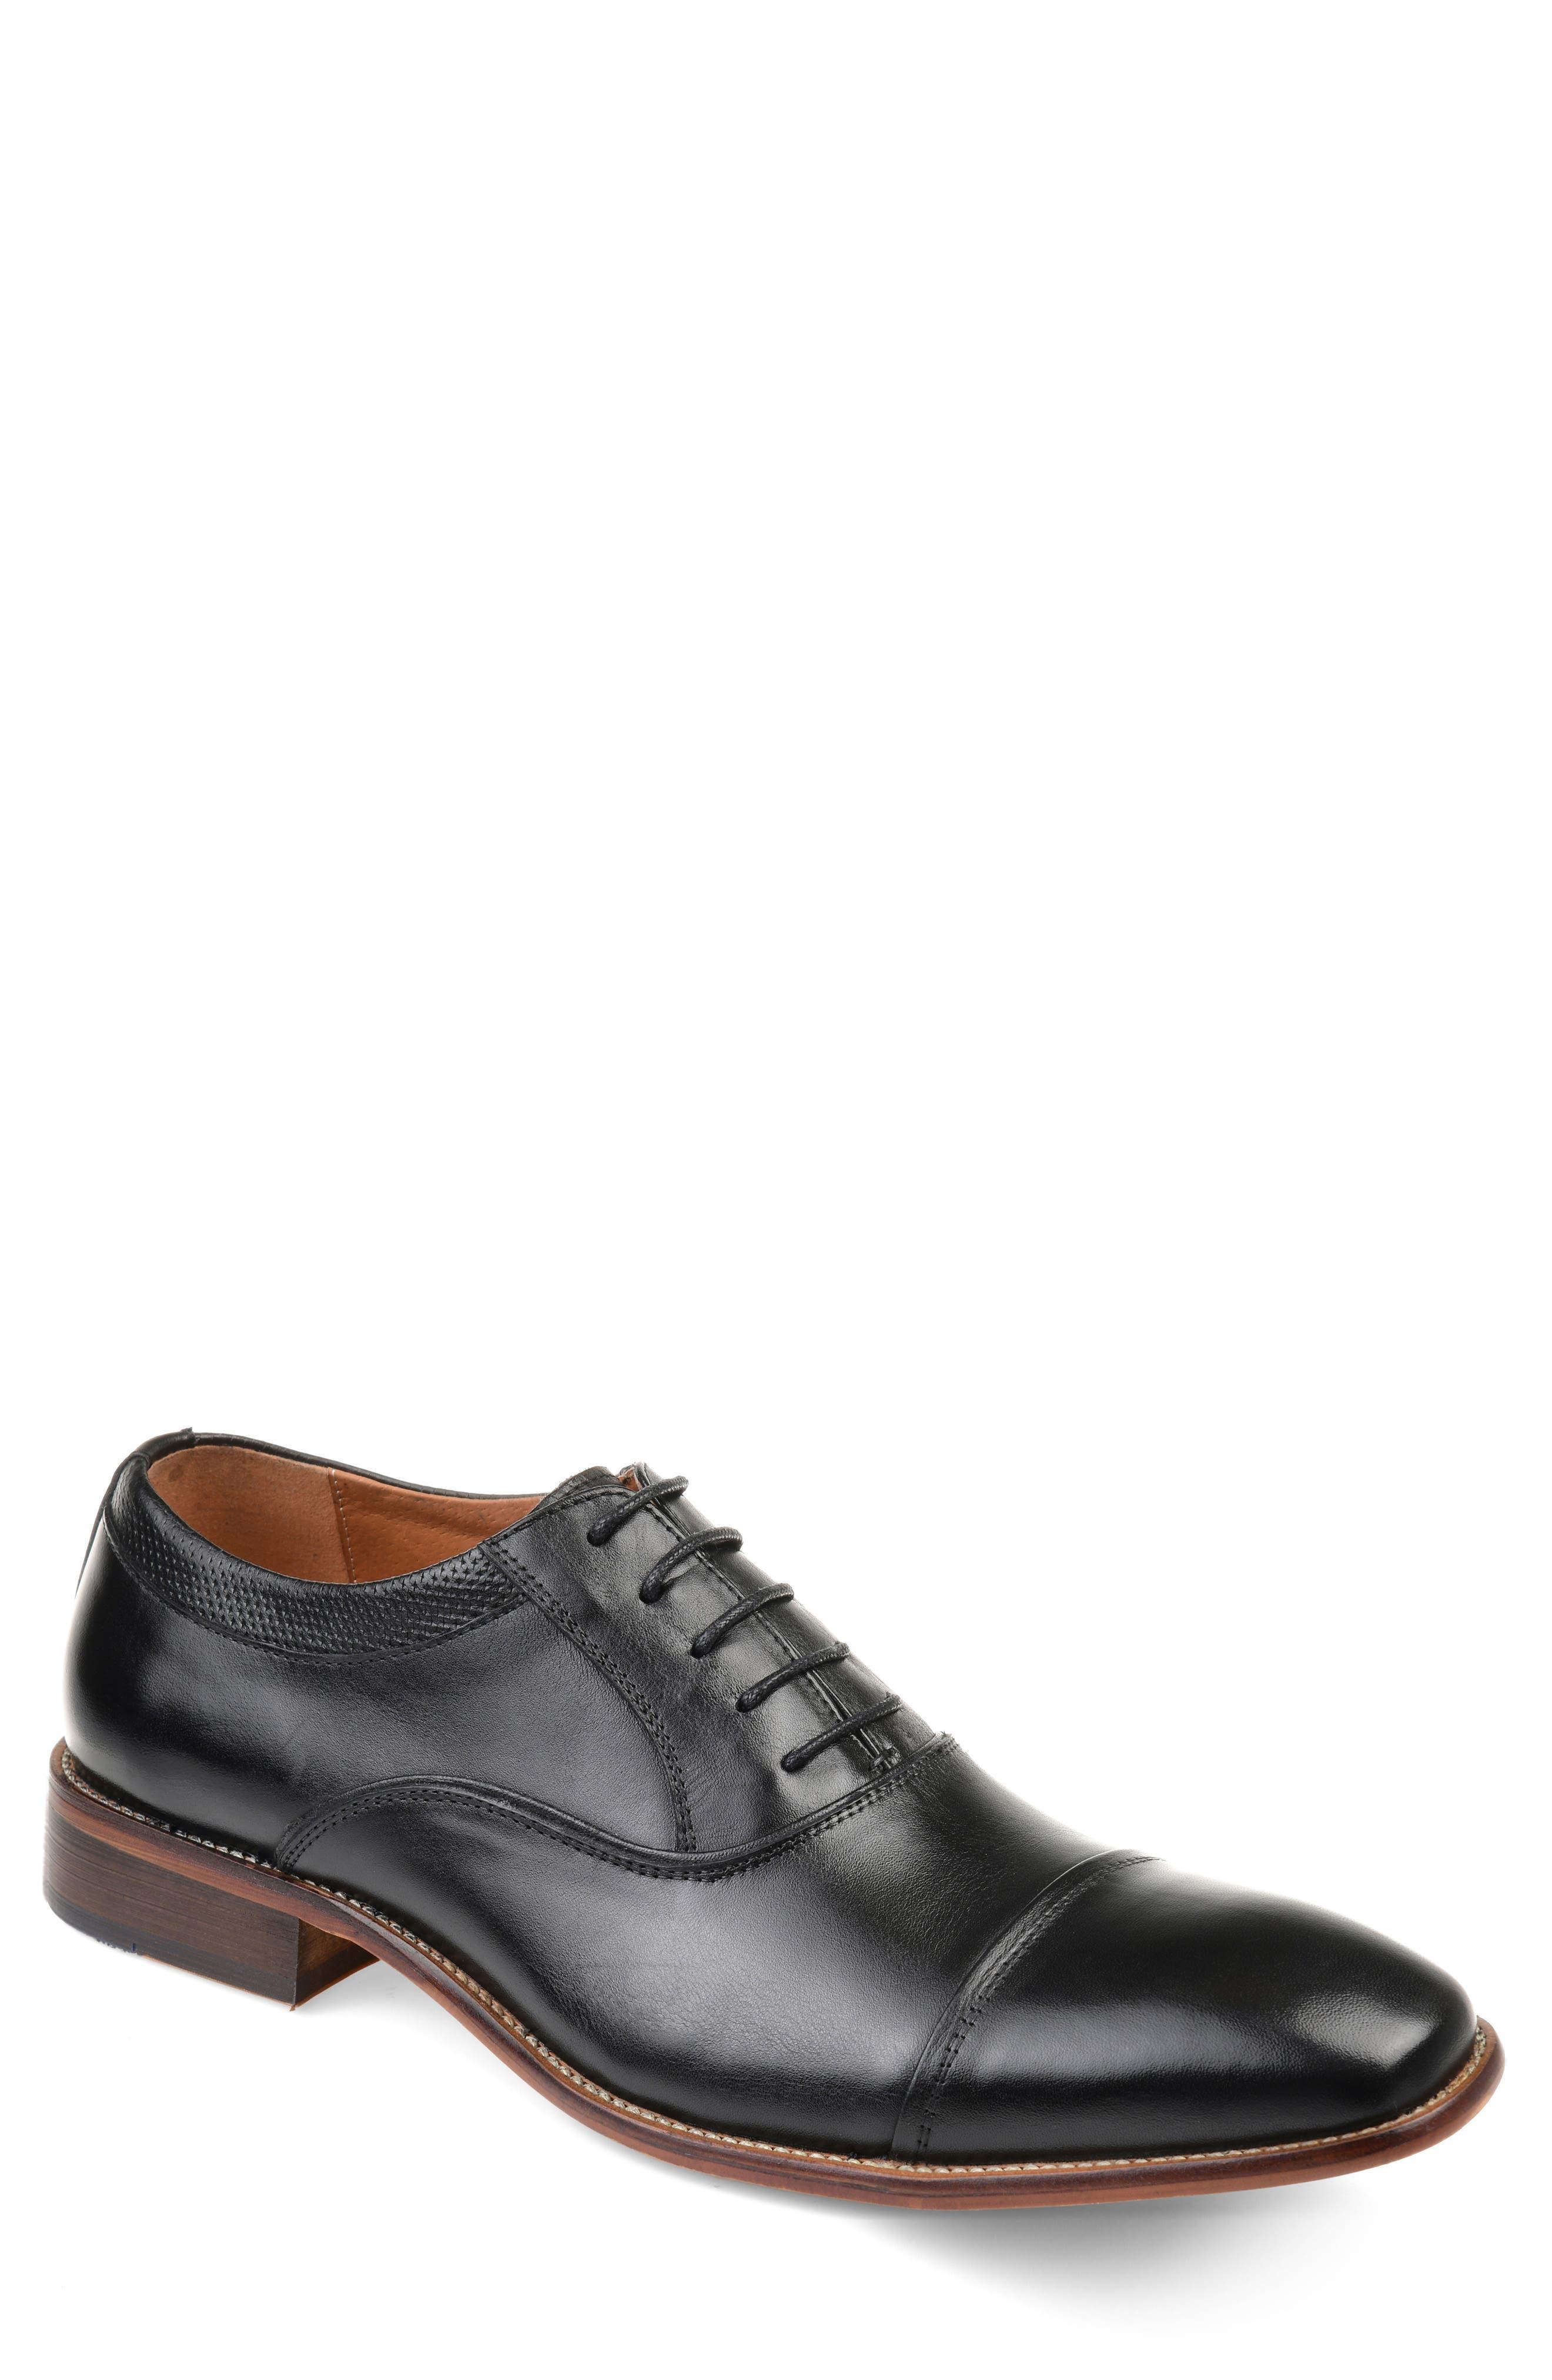 THOMAS AND VINE Keaton Cap Toe Oxford, Main, color, BLACK LEATHER